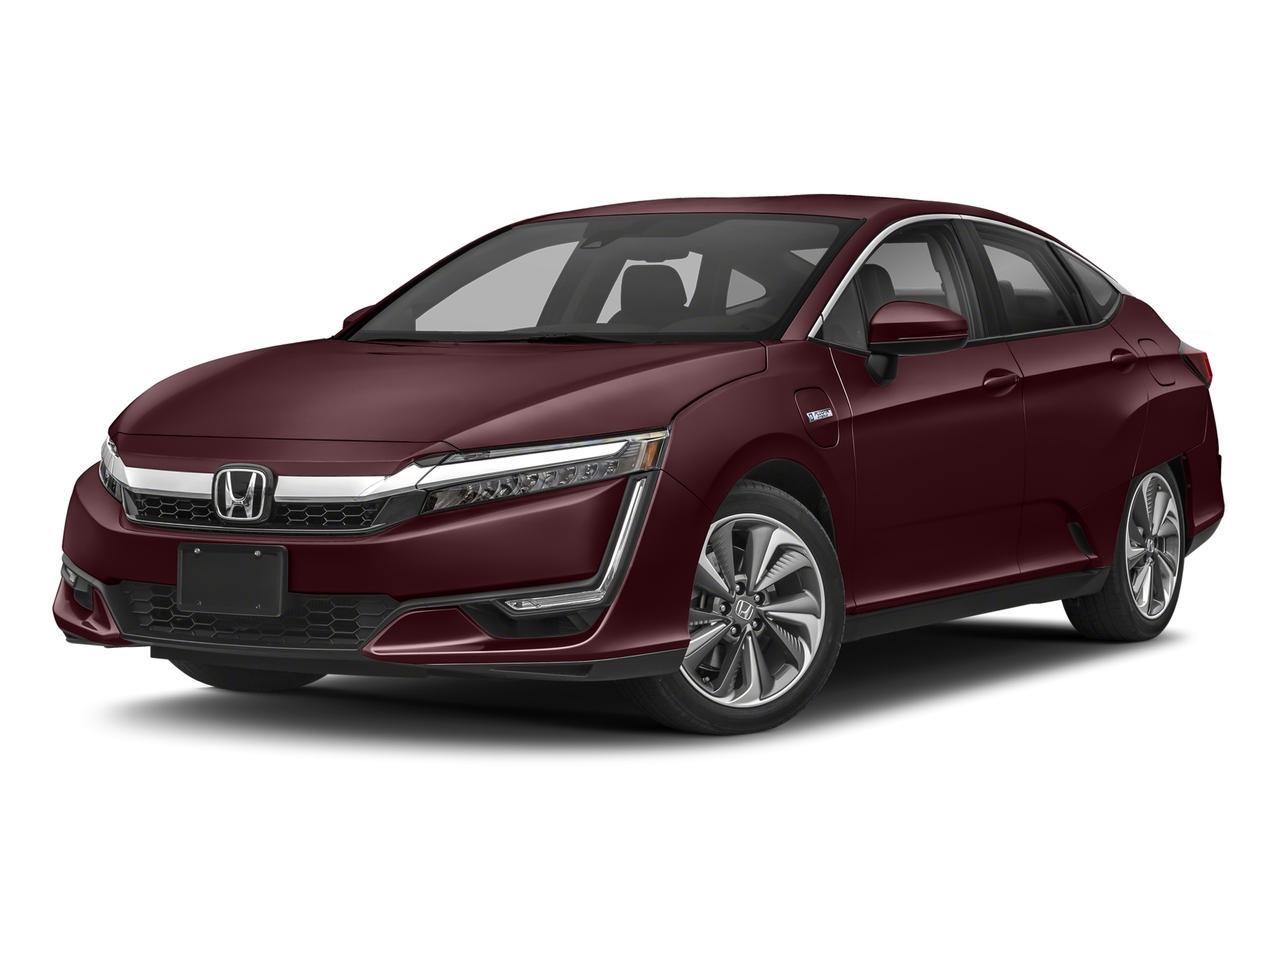 2018 Honda Clarity Plug-In Hybrid Vehicle Photo in Pleasanton, CA 94588